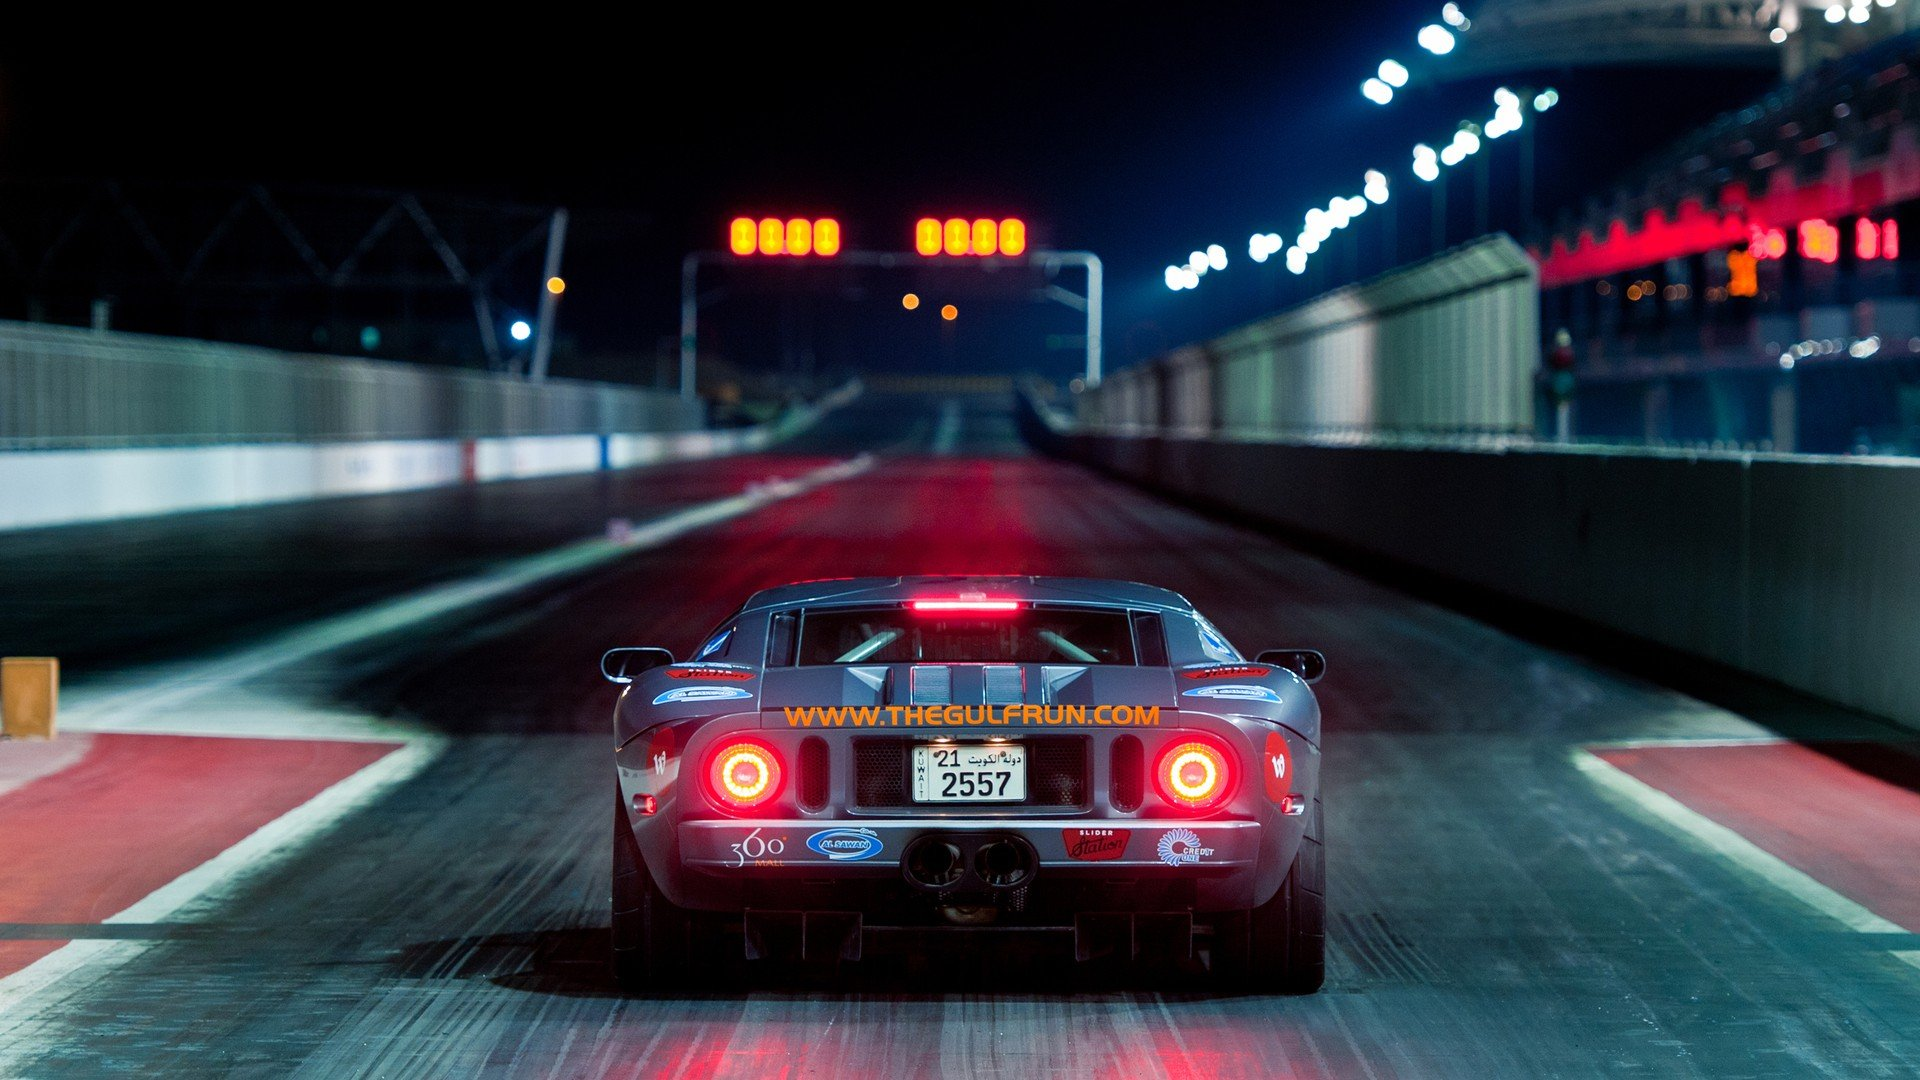 Cars Ford GT drag racing drag cars wallpaper 1920x1080 234873 1920x1080